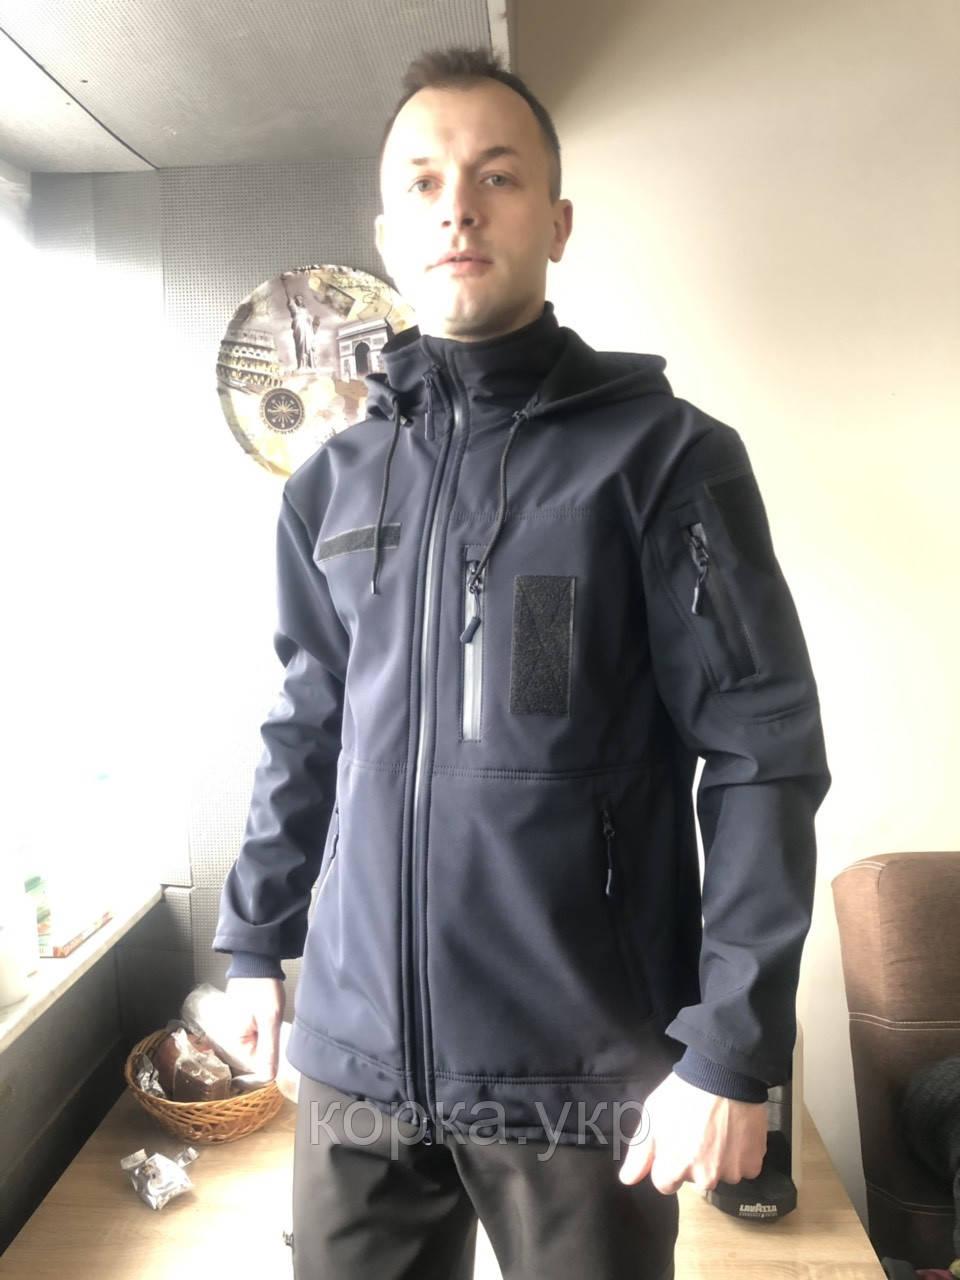 Куртка SOFT SHELL ДСНС (МЧС) Темно синяя с боковыми молниями под кобуру